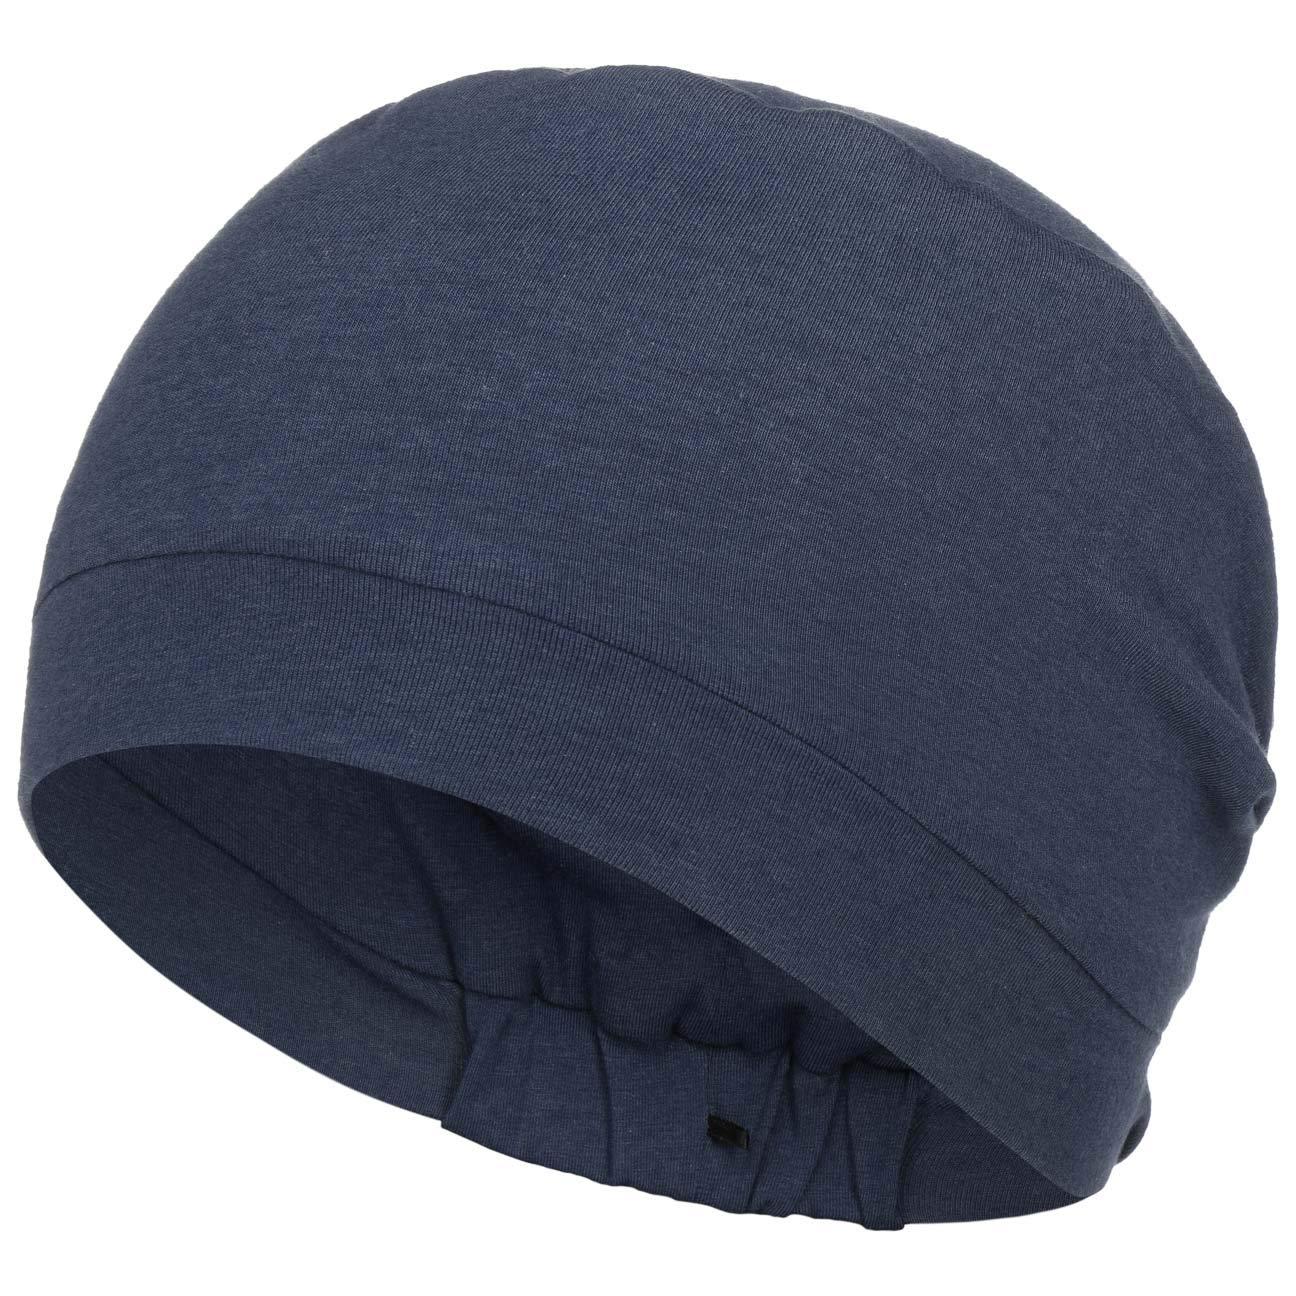 Christine Headwear Laura-Uni Baumwollturban Kopftuch Turban Damenturban Chemo-Kopfbedeckung